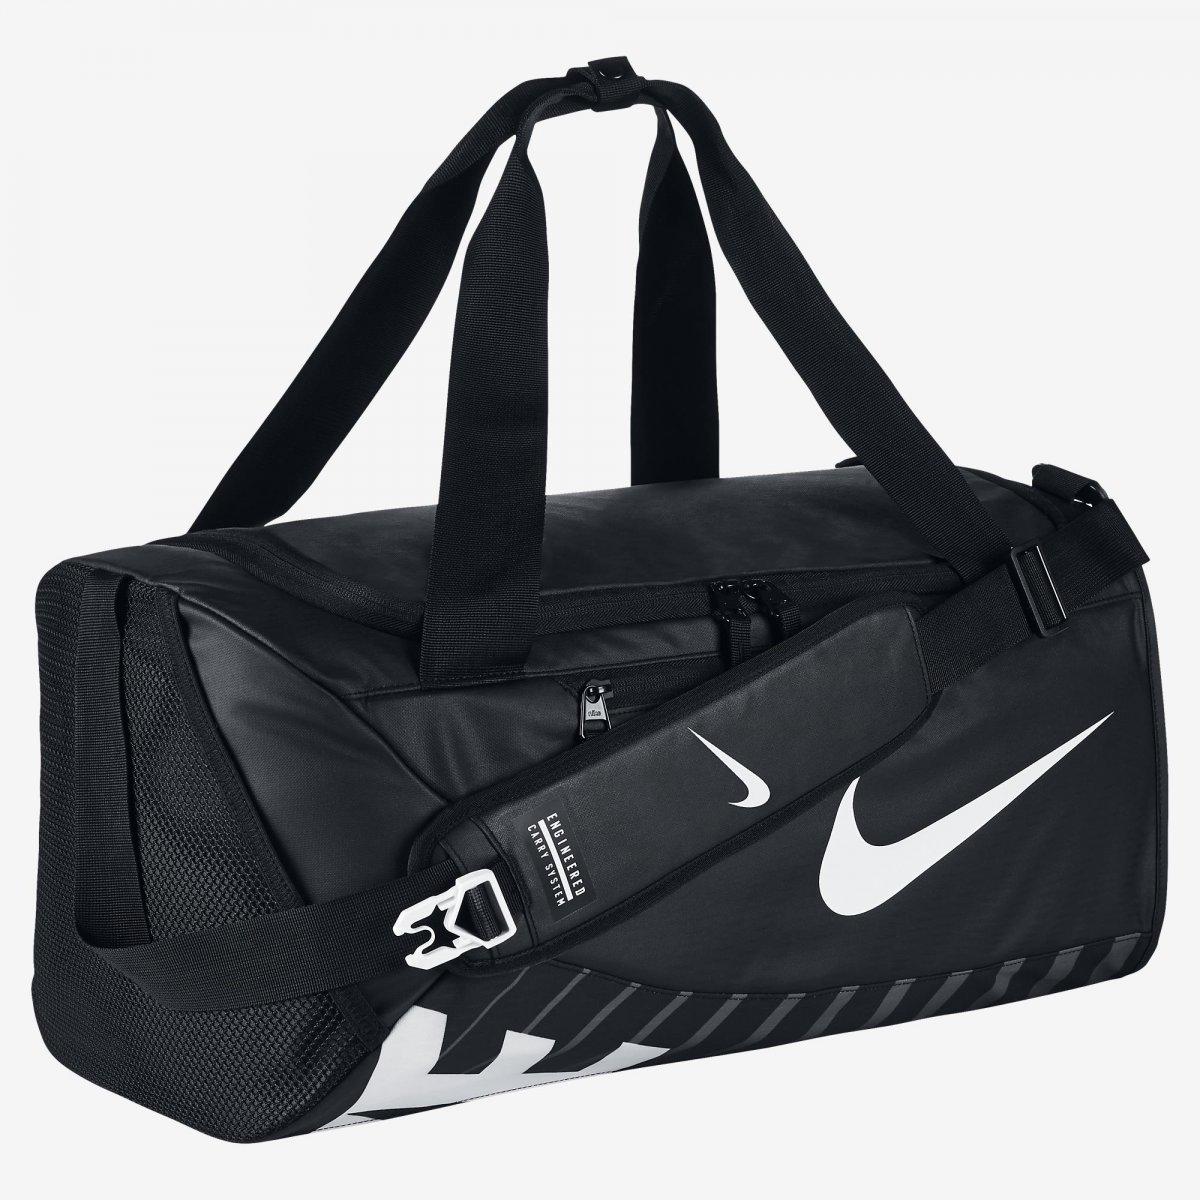 0a2f422e8 Bolsa Mala Nike Alpha Duffel Small